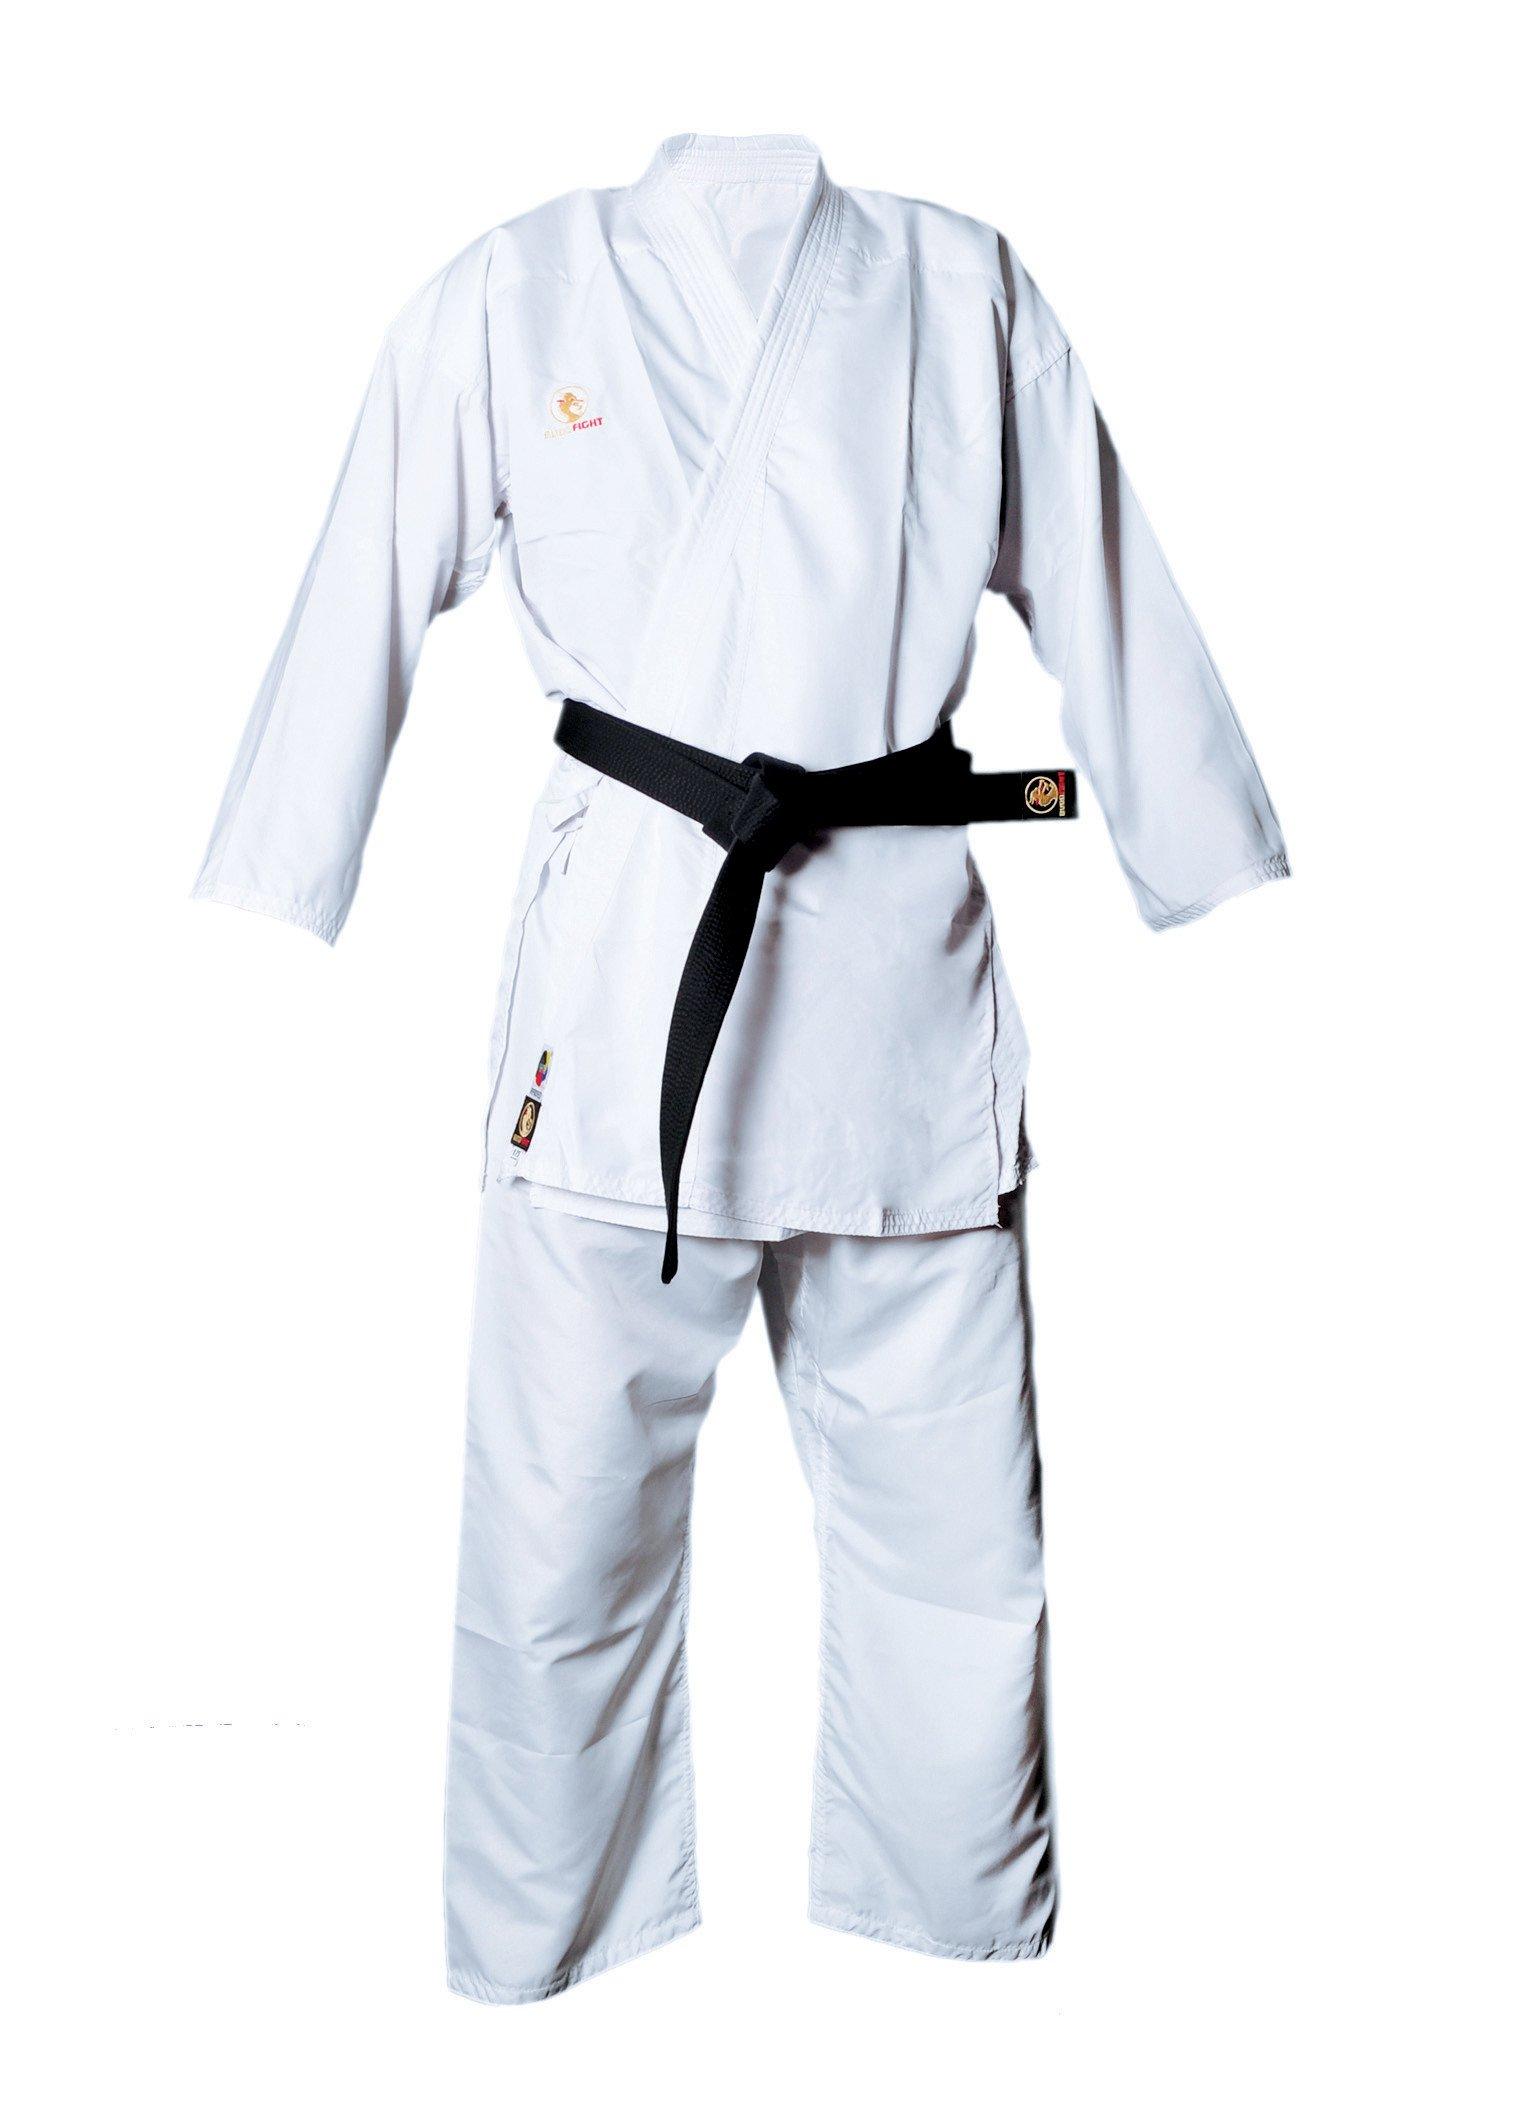 Kimono karaté Master spécial compétition